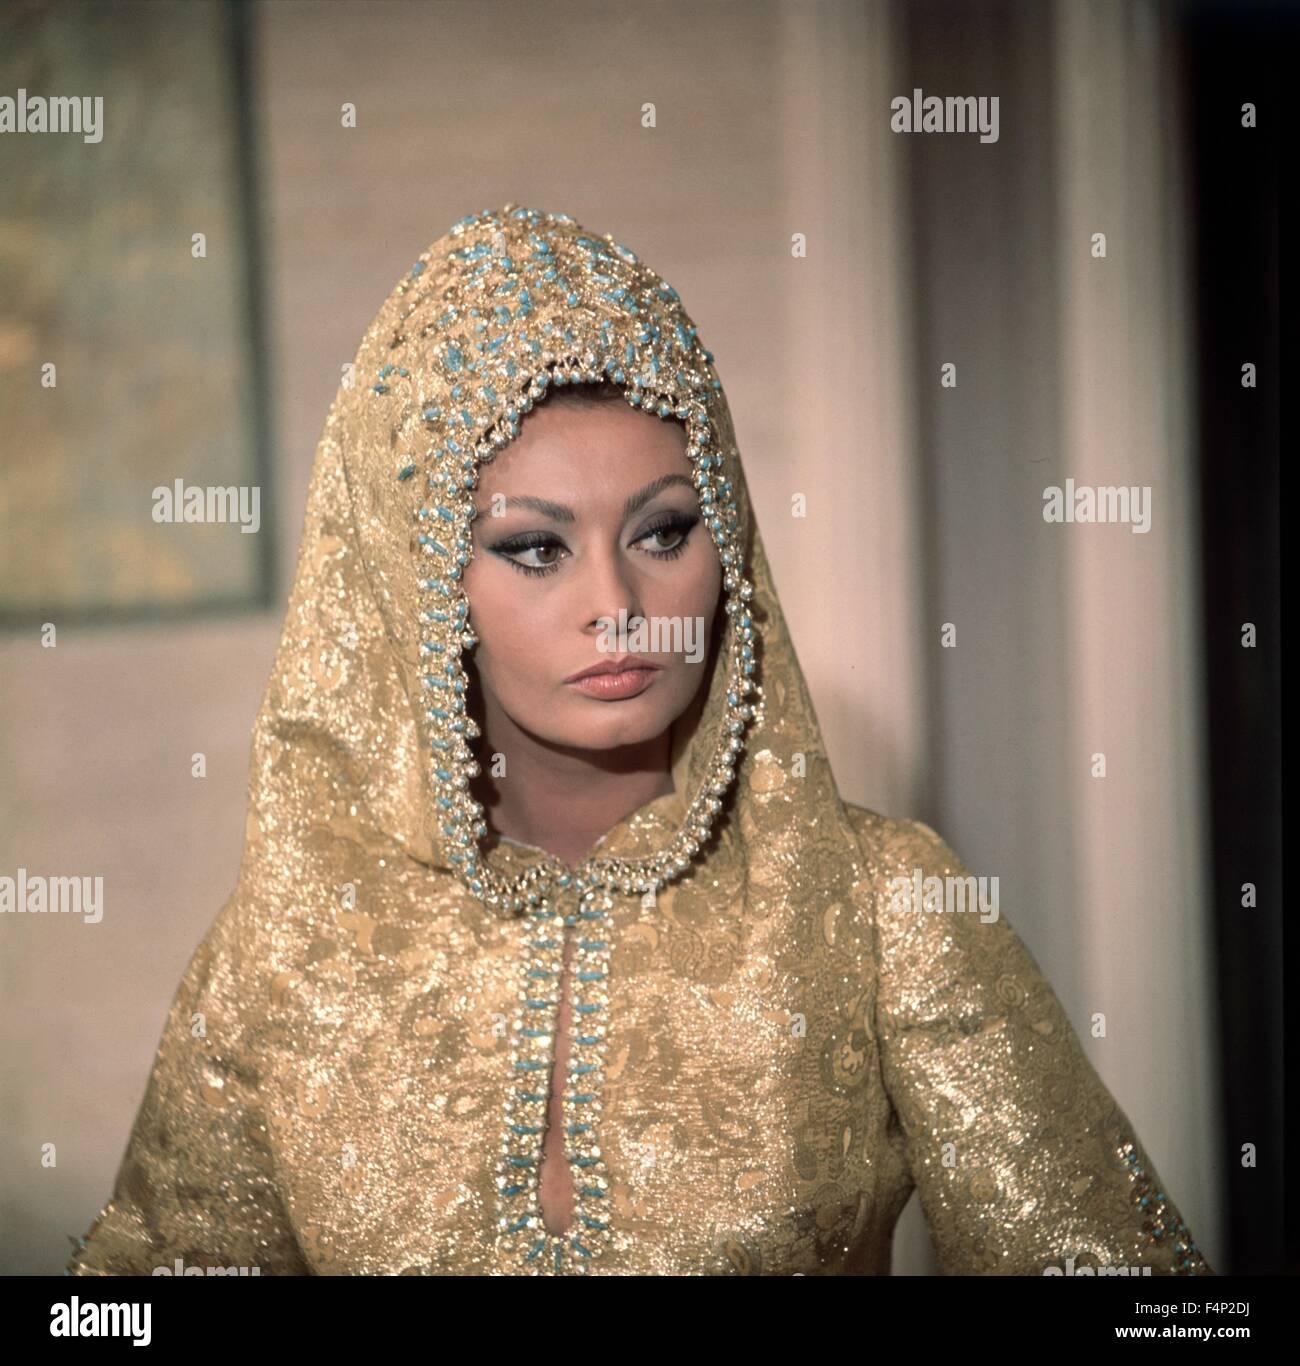 Sophia Loren / Arabesque 1966 directed by Stanley Donen - Stock Image